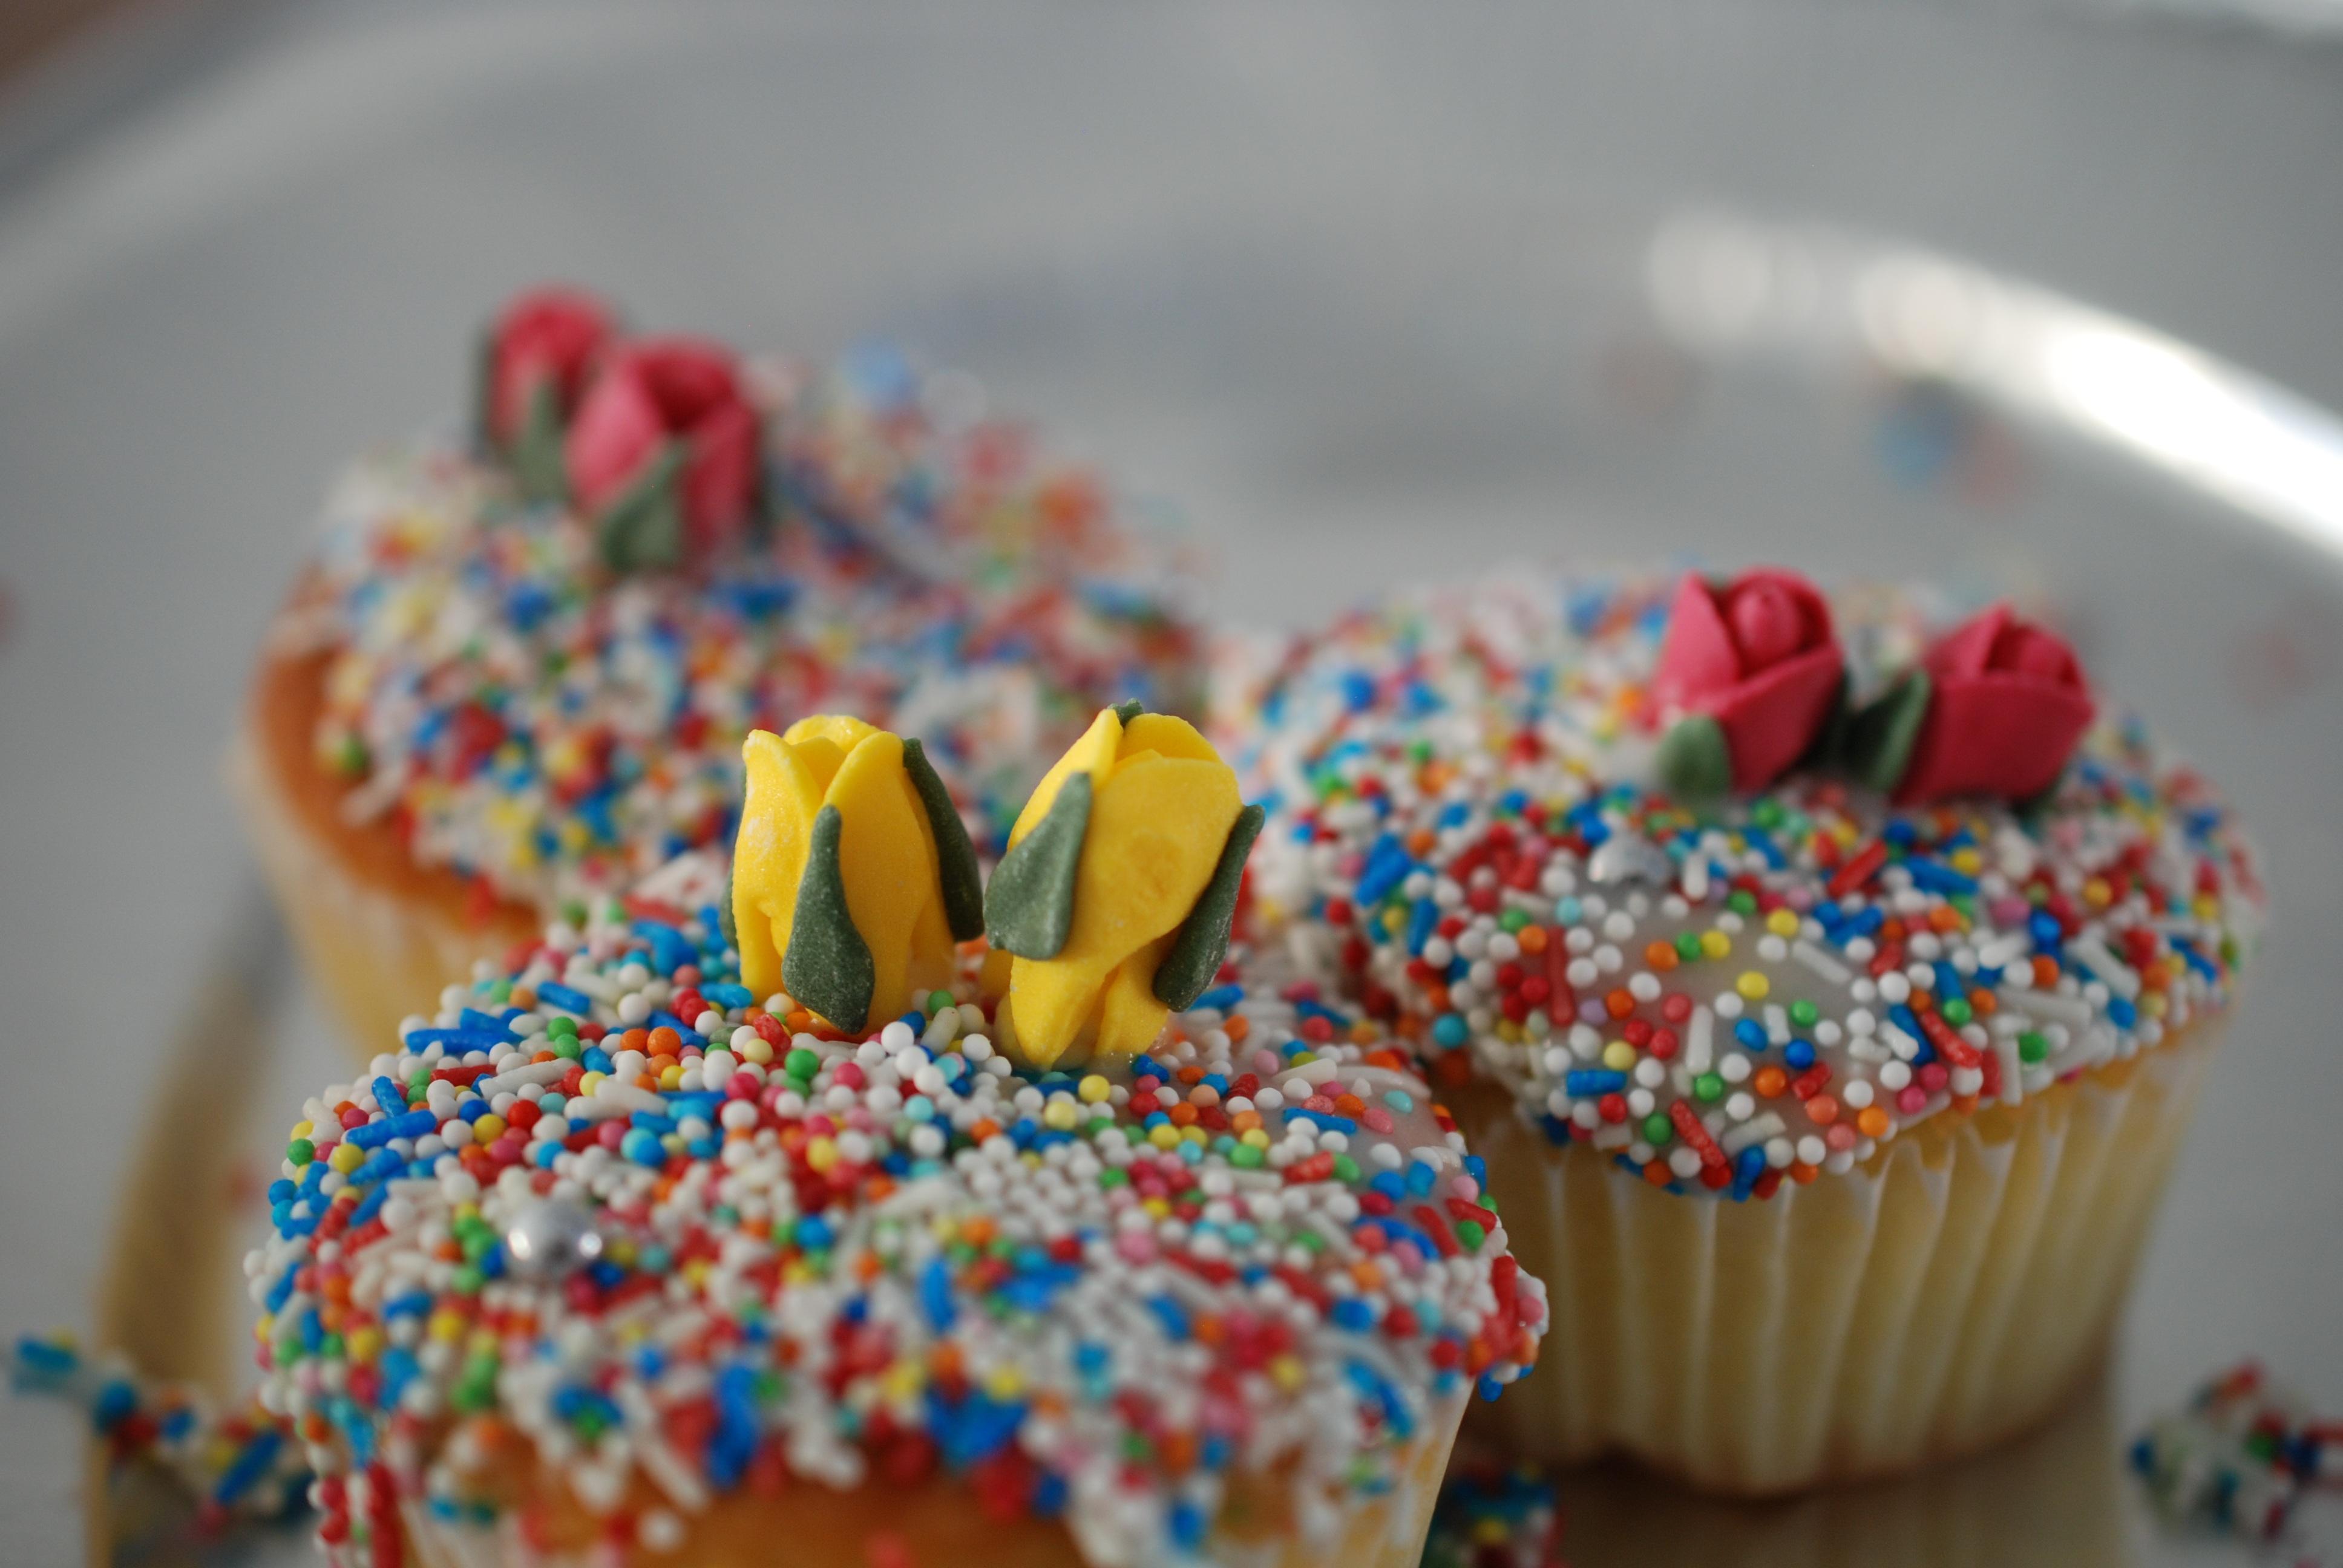 Free Images : decoration, cupcake, baking, cookie, dessert, icing ...